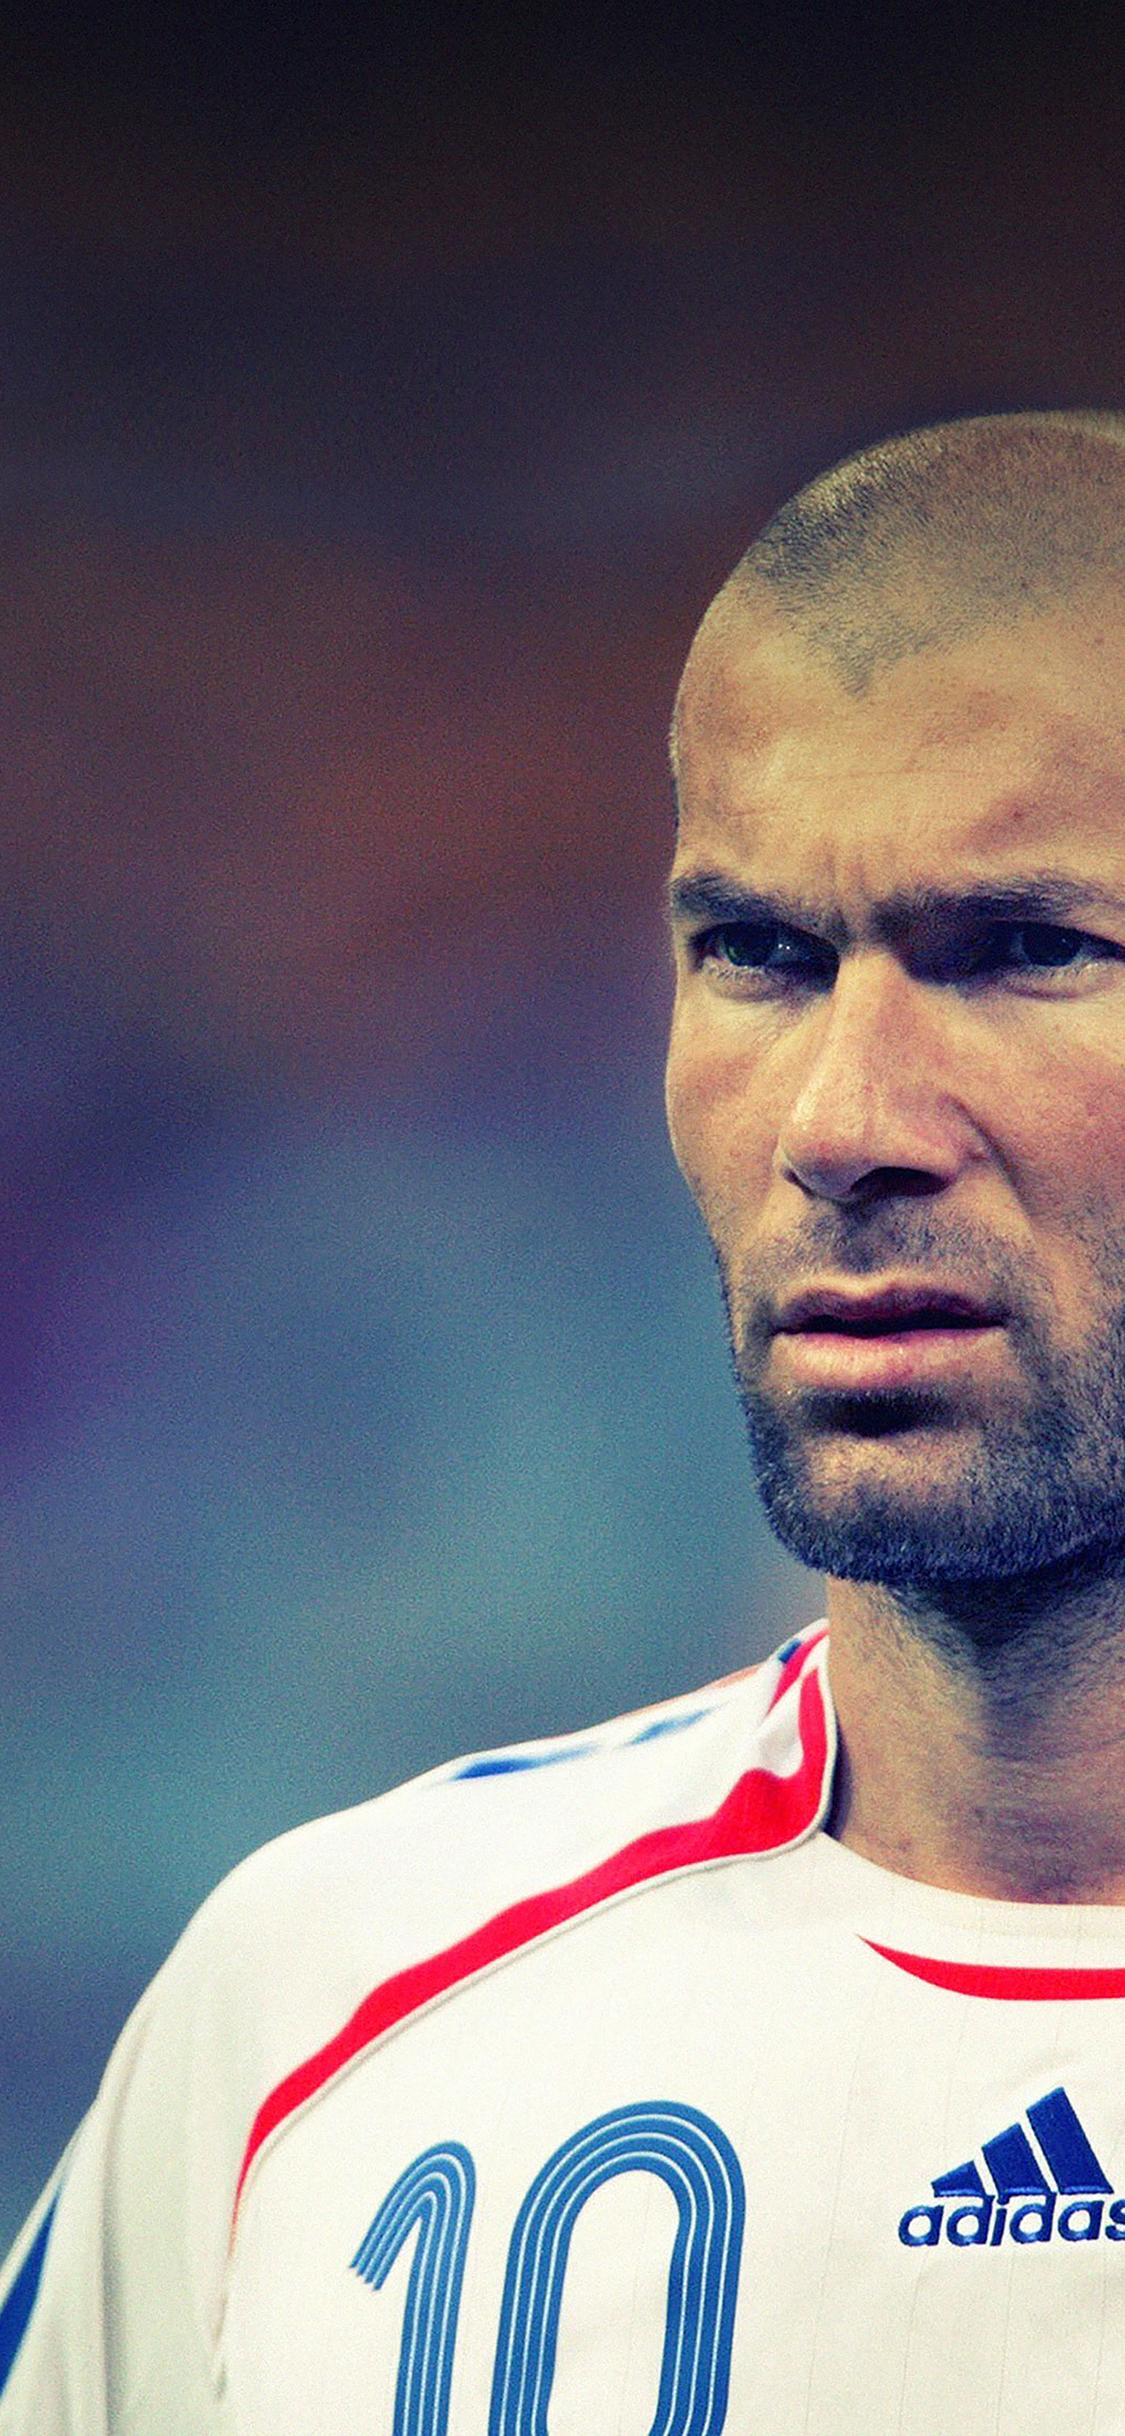 iPhoneXpapers.com-Apple-iPhone-wallpaper-ha75-wallpaper-zidane-soccer-star-sports